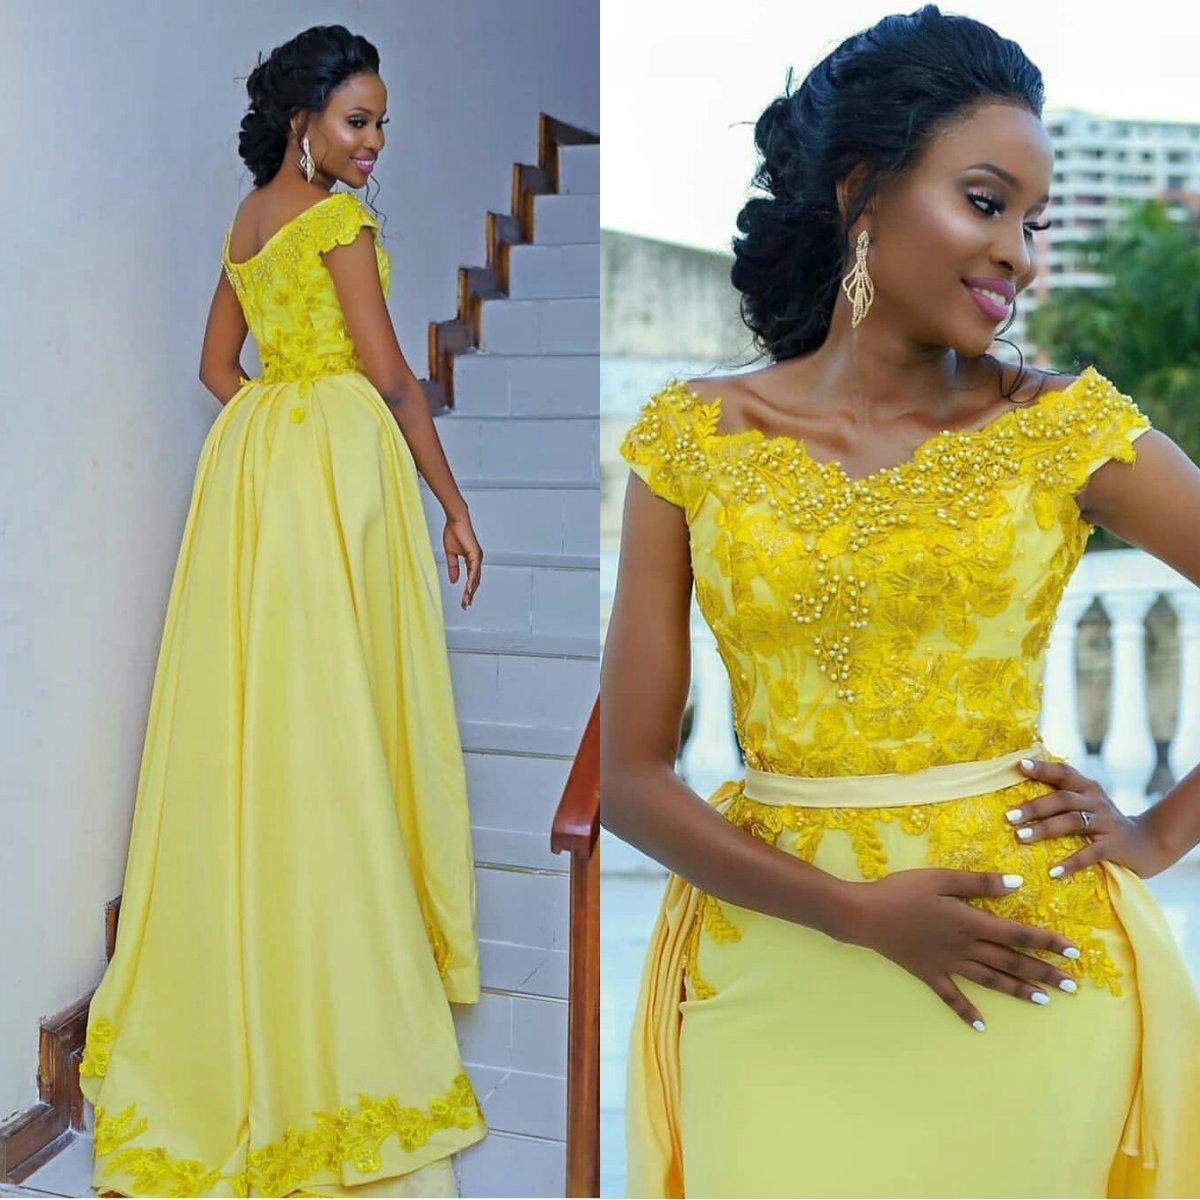 Elegant Satin Mermaid Evening Dresses With Detachable Train Off Shoulder Applique Lace Beaded Prom Dress Party Gowns vestidos de novia